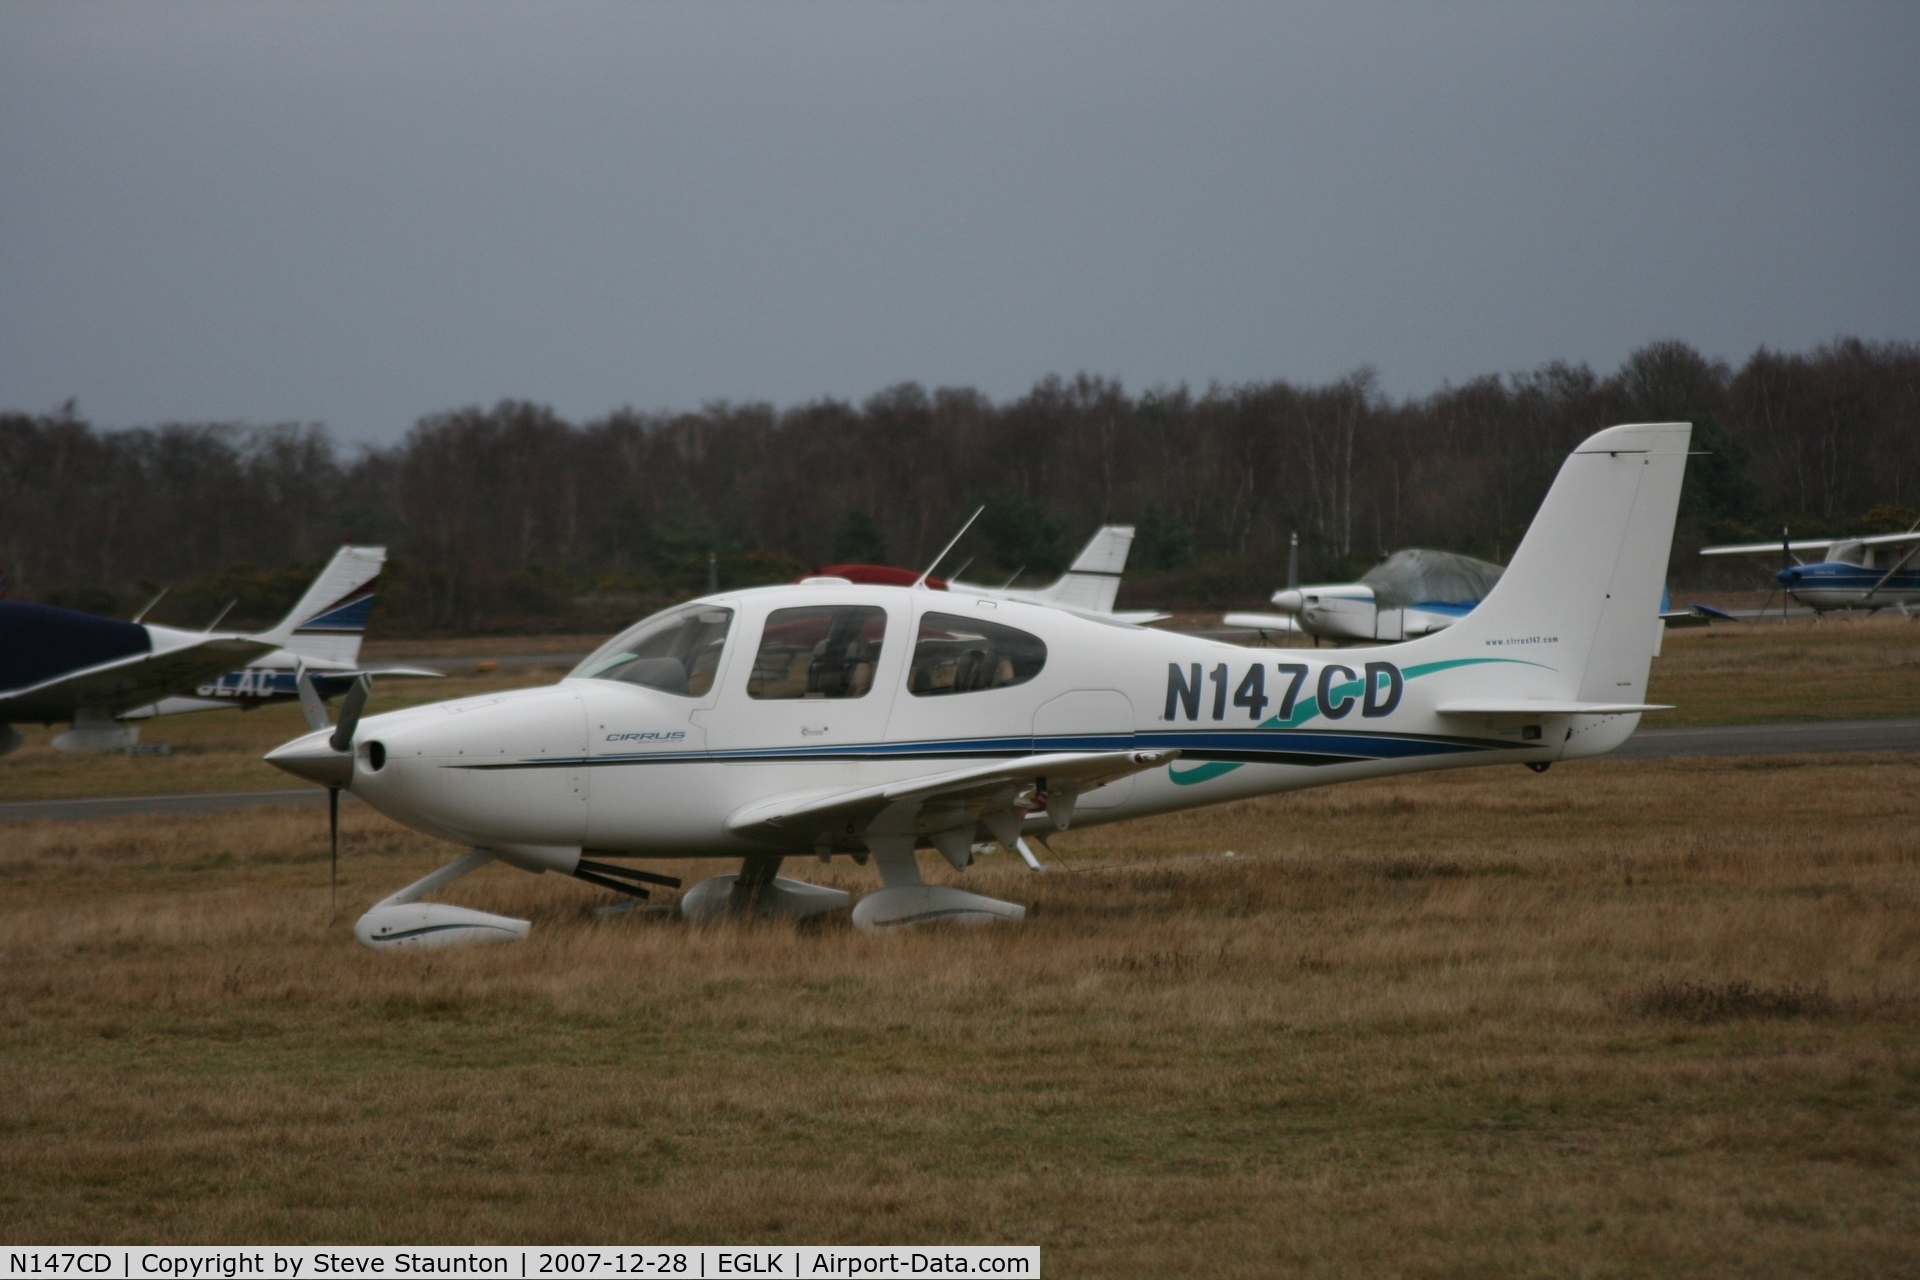 N147CD, 2000 Cirrus SR20 C/N 1043, Taken at Blackbushe Airport 28th December 2007